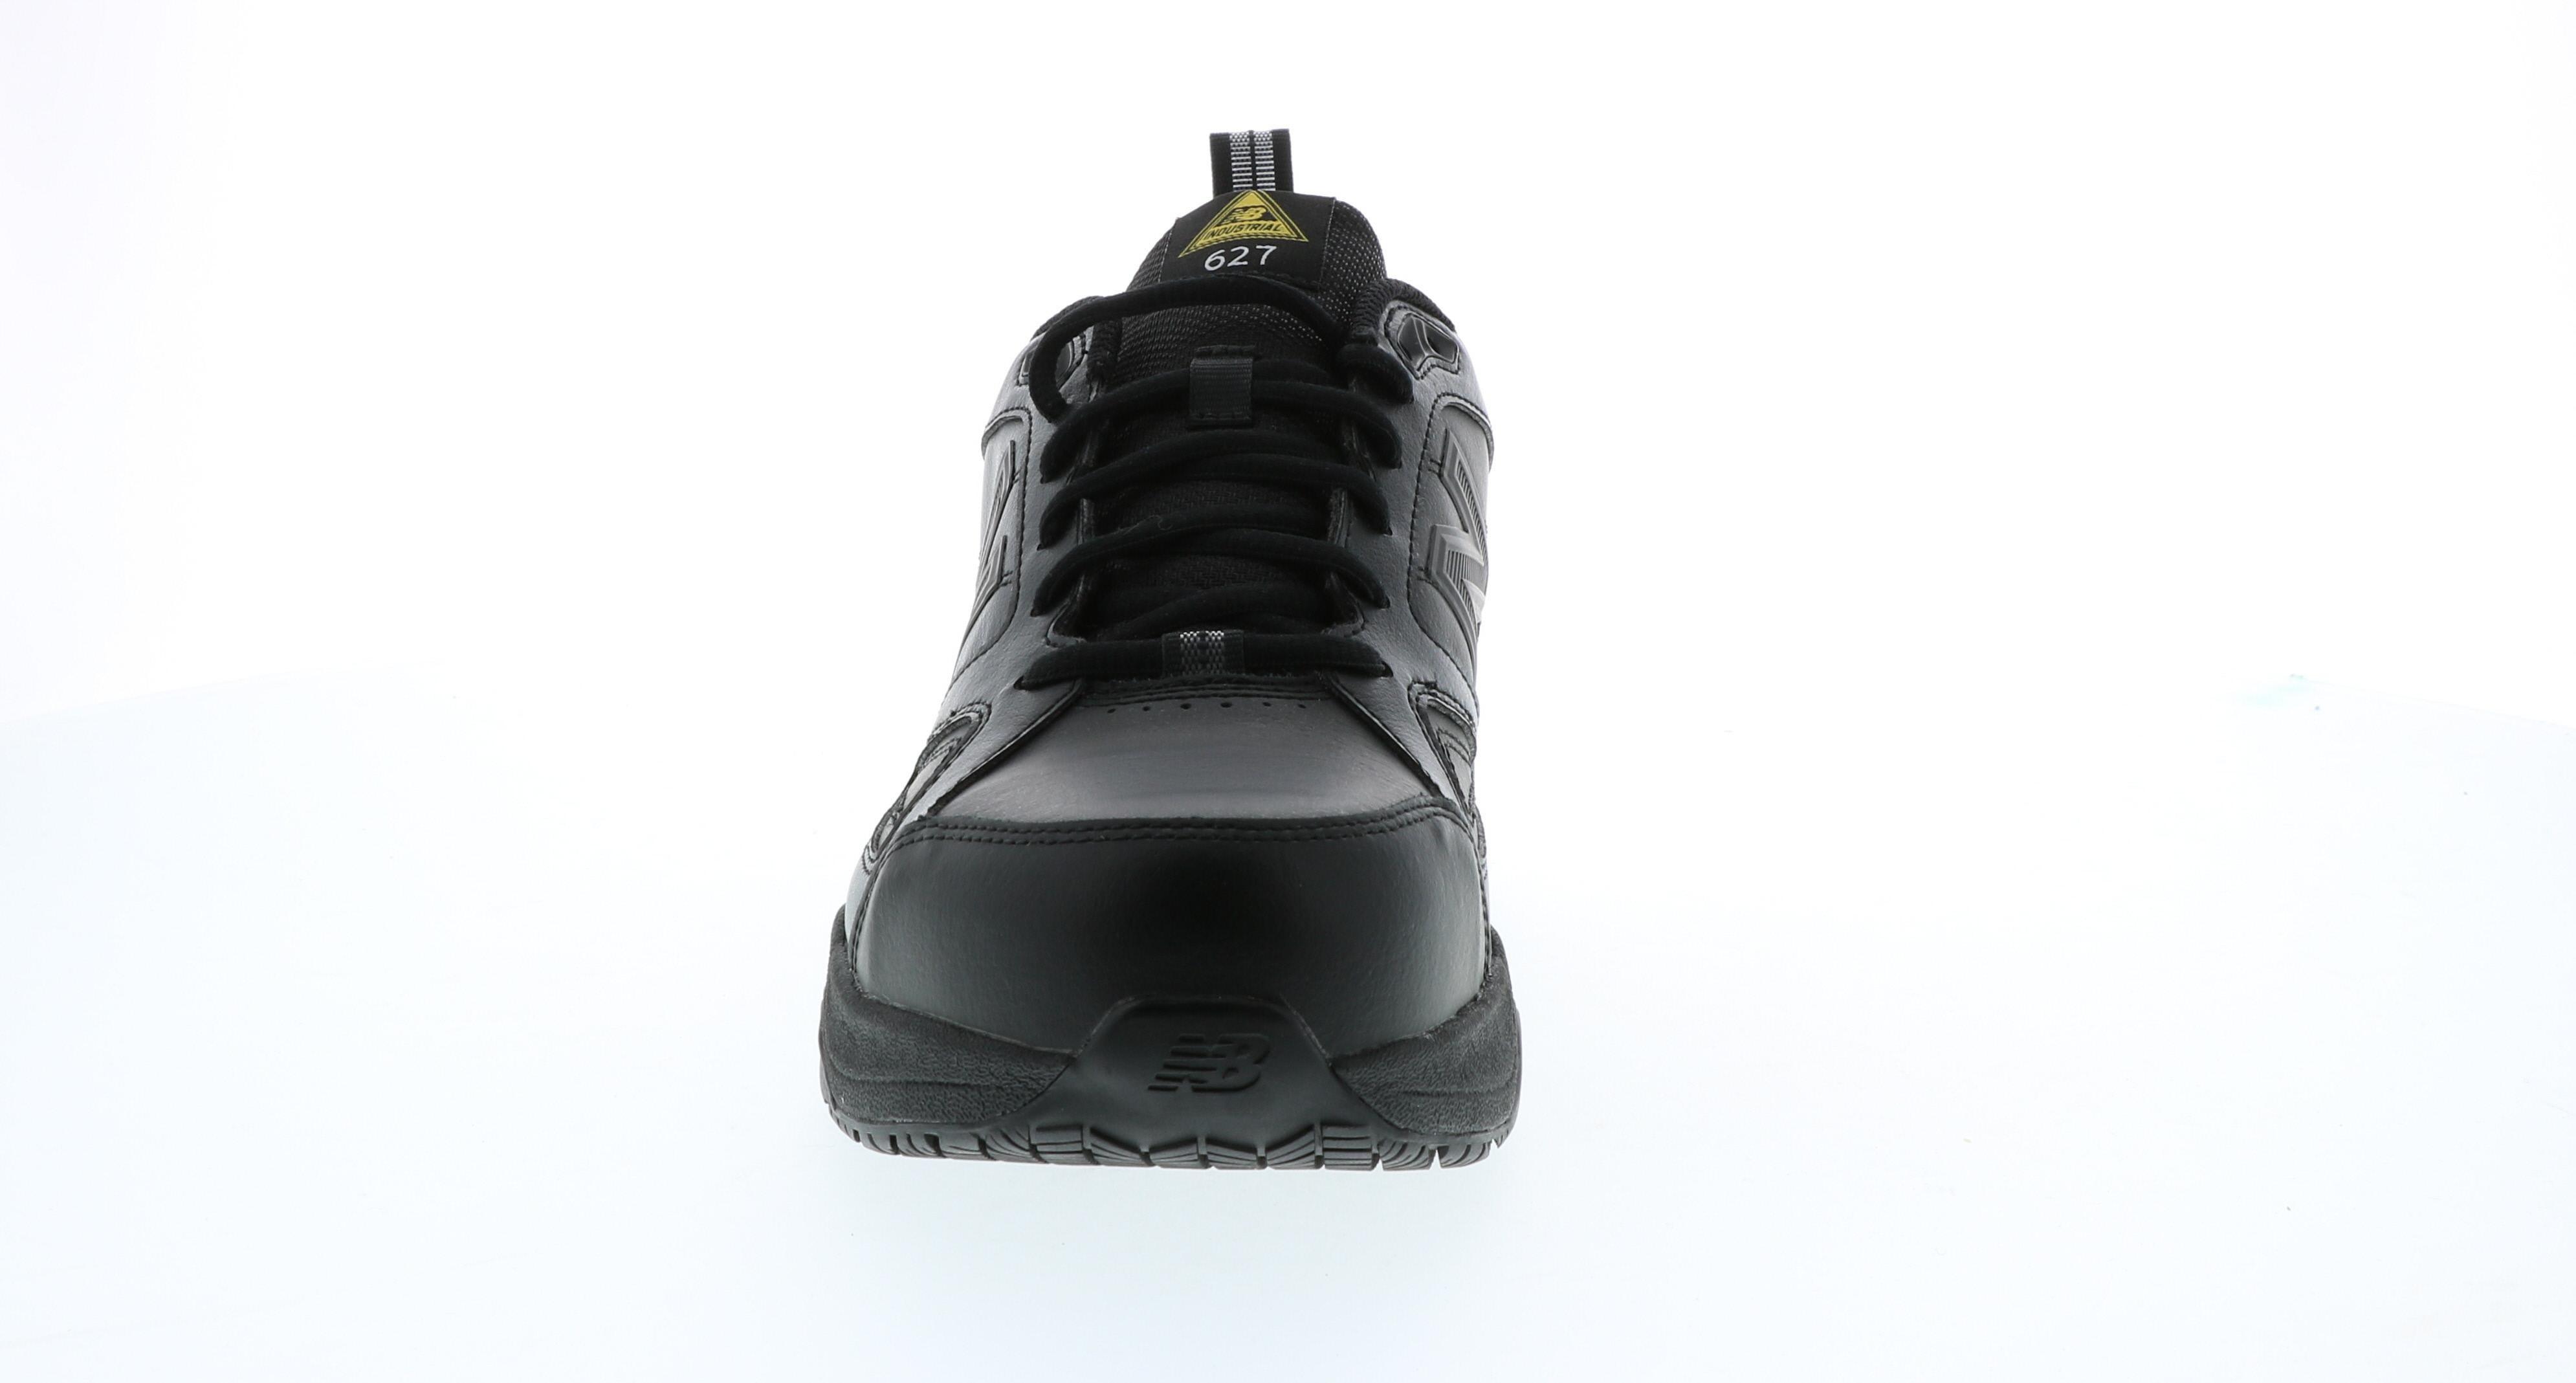 2ba9663f37f5a Men's New Balance 627v2 Steel Toe